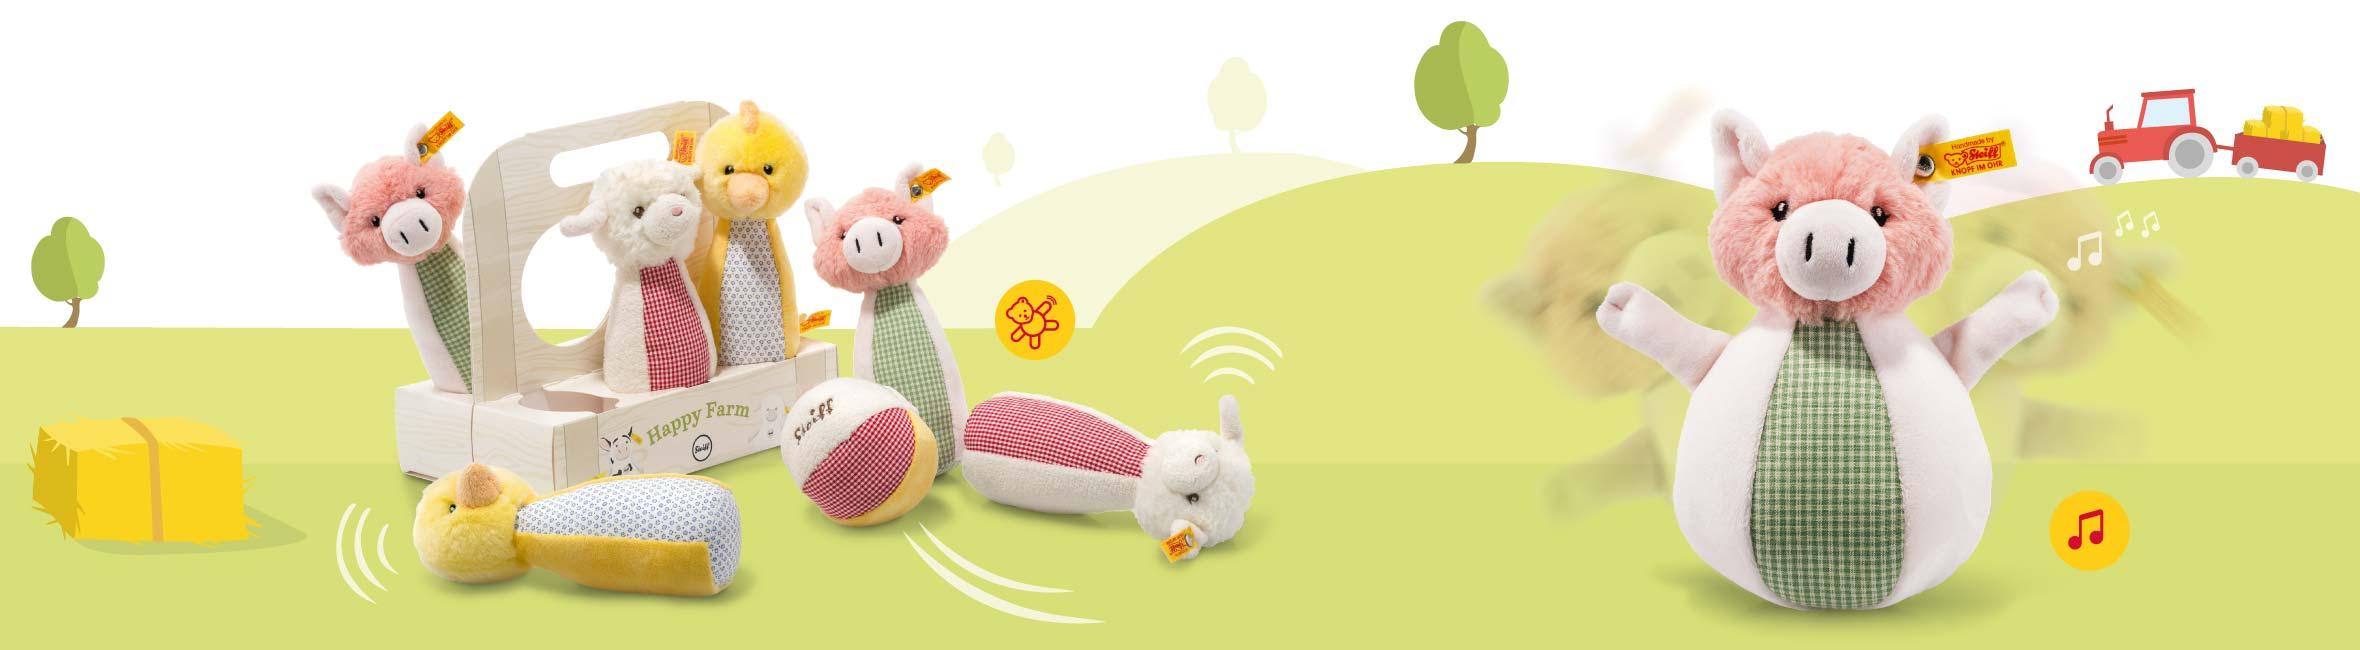 190801-teddybaerenkuscheltiere-happyfarm-2360x650px.jpg